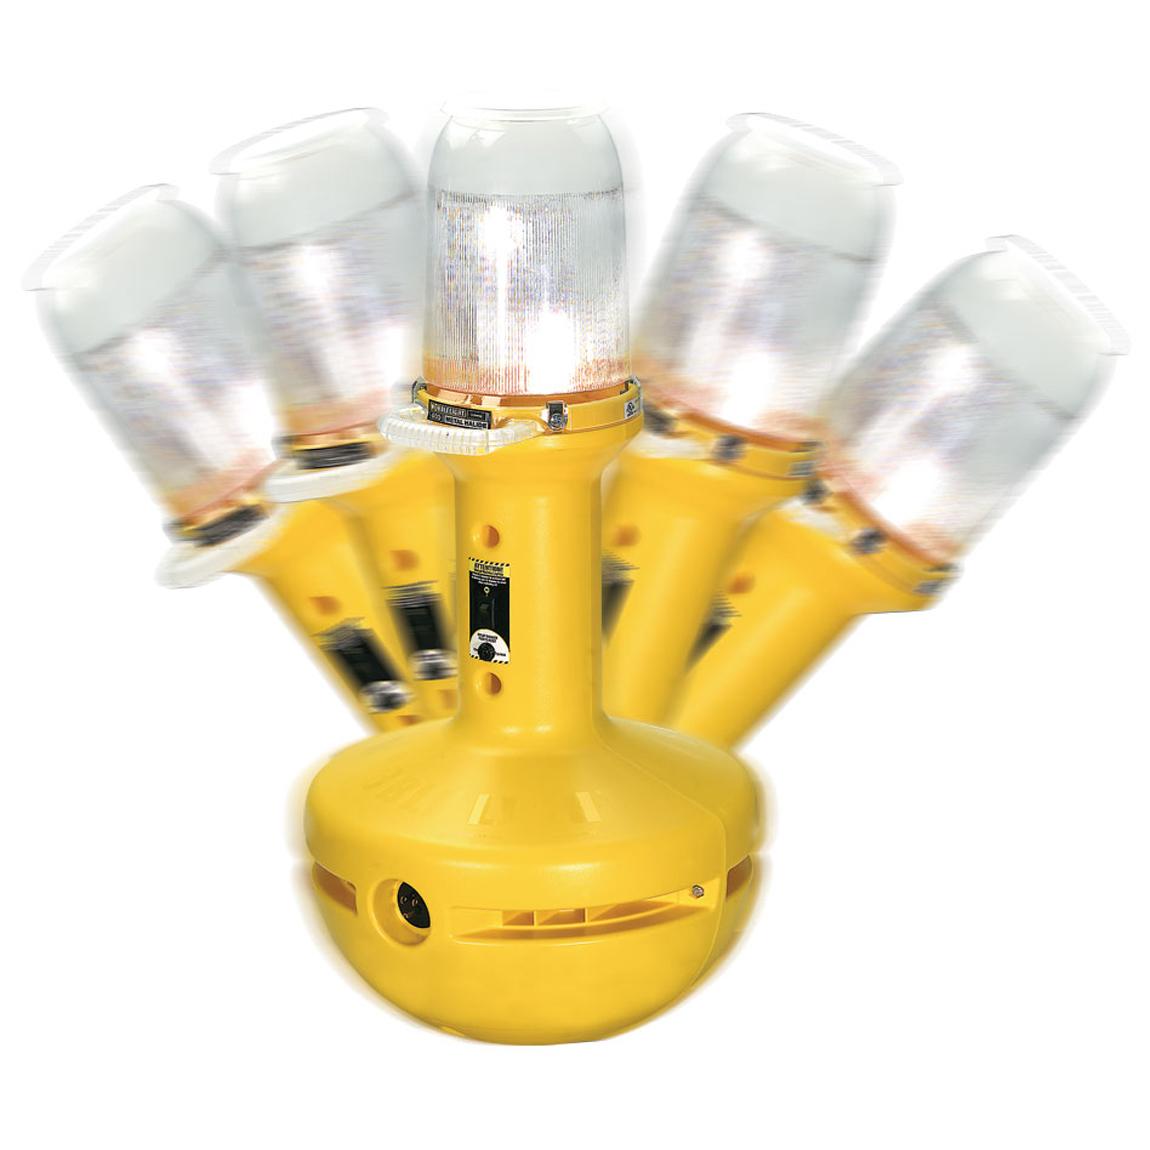 Portable jobsite lighting image